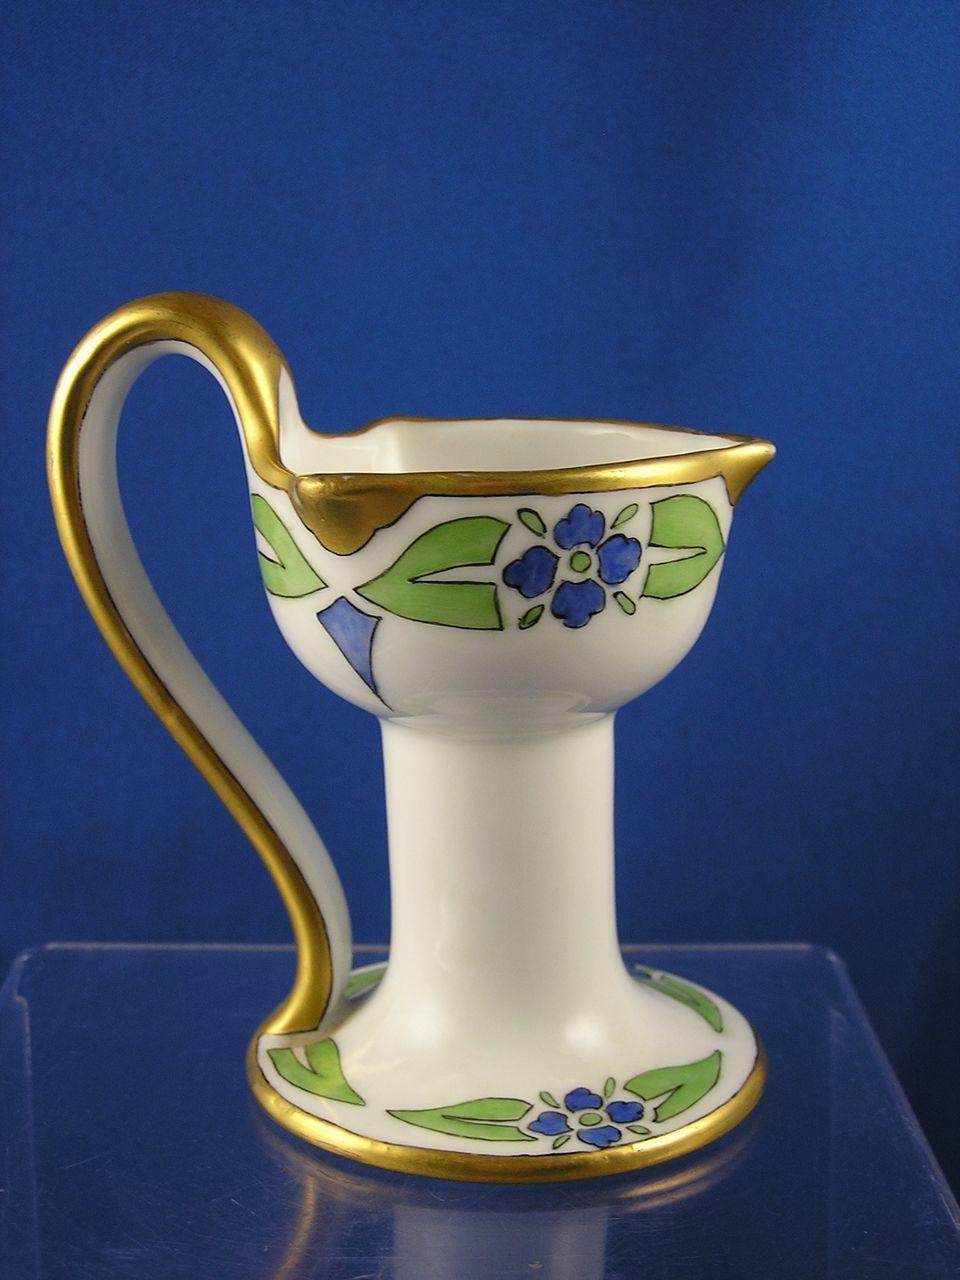 Pfeiffer lowenstein p l austria arts crafts floral for Candle holder crafts